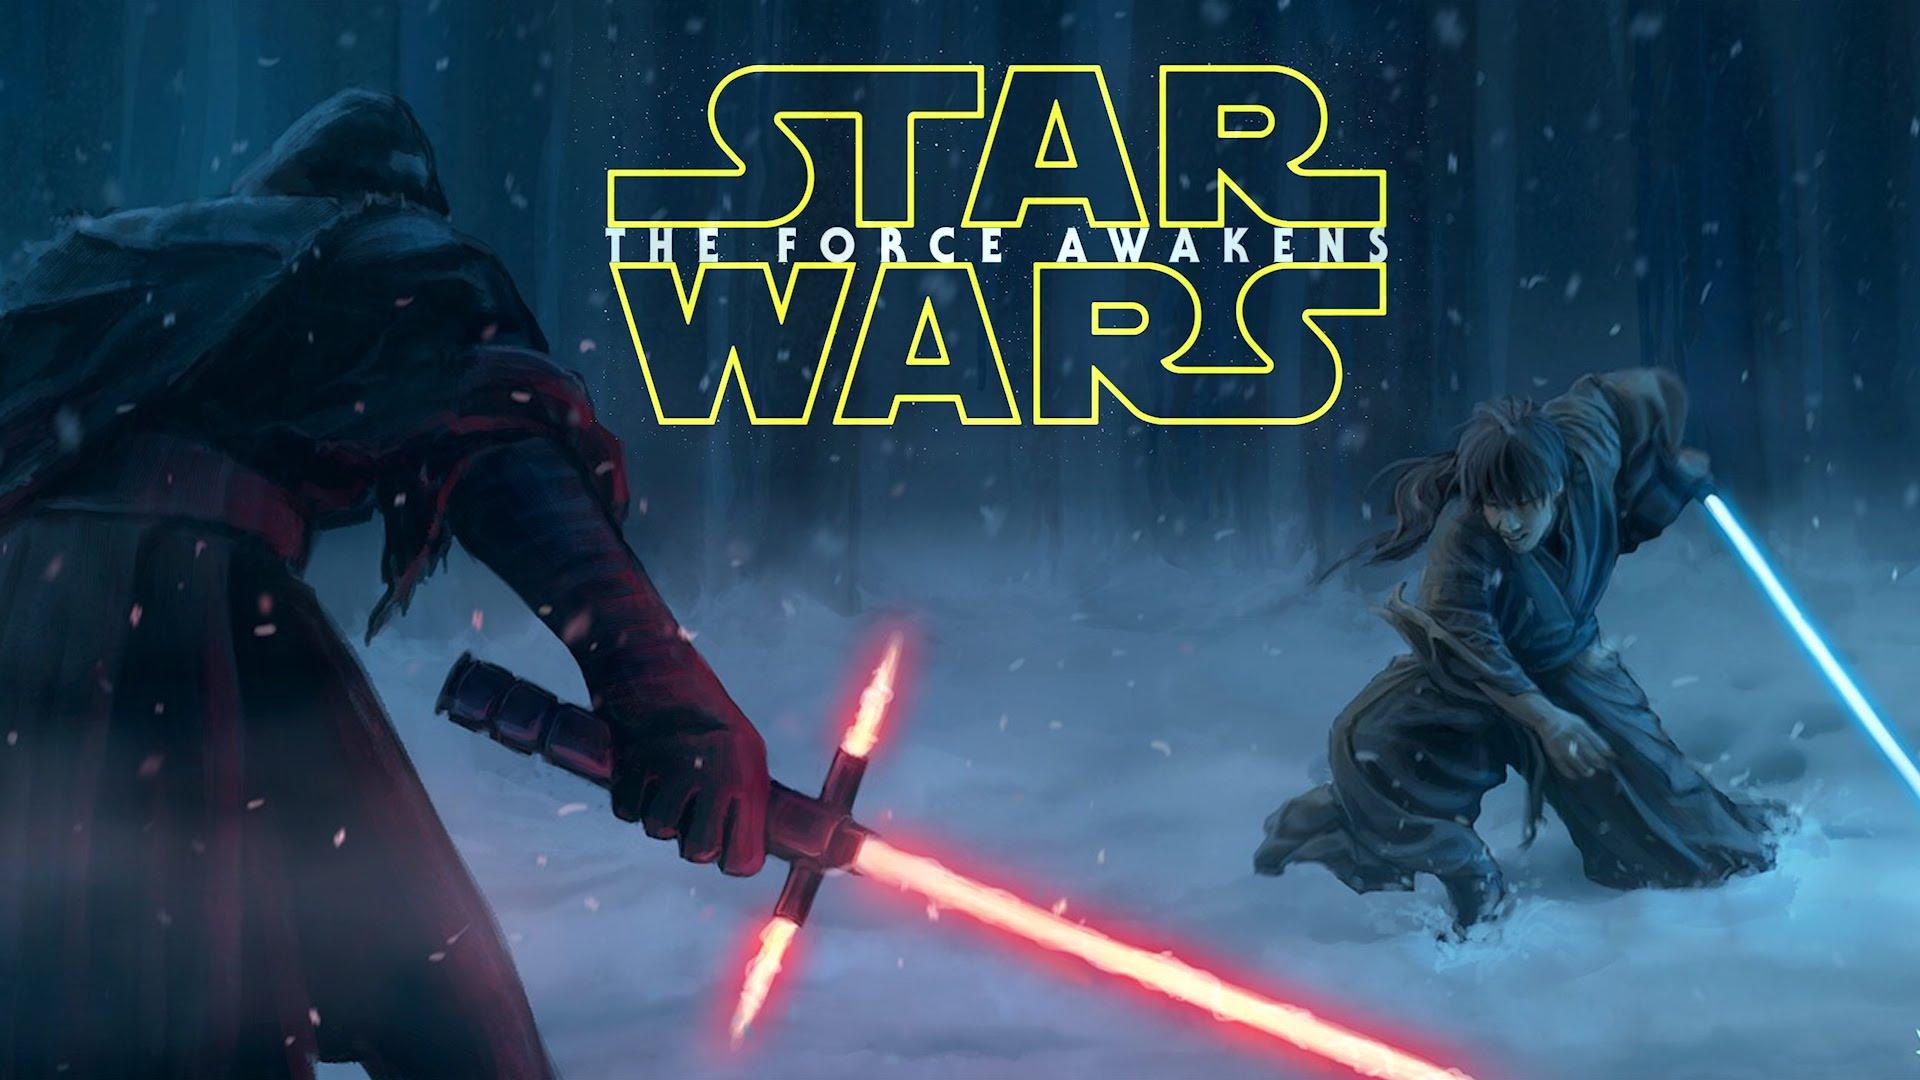 Star Wars The Force Awakens Star Wars Wallpaper 39209175 Fanpop